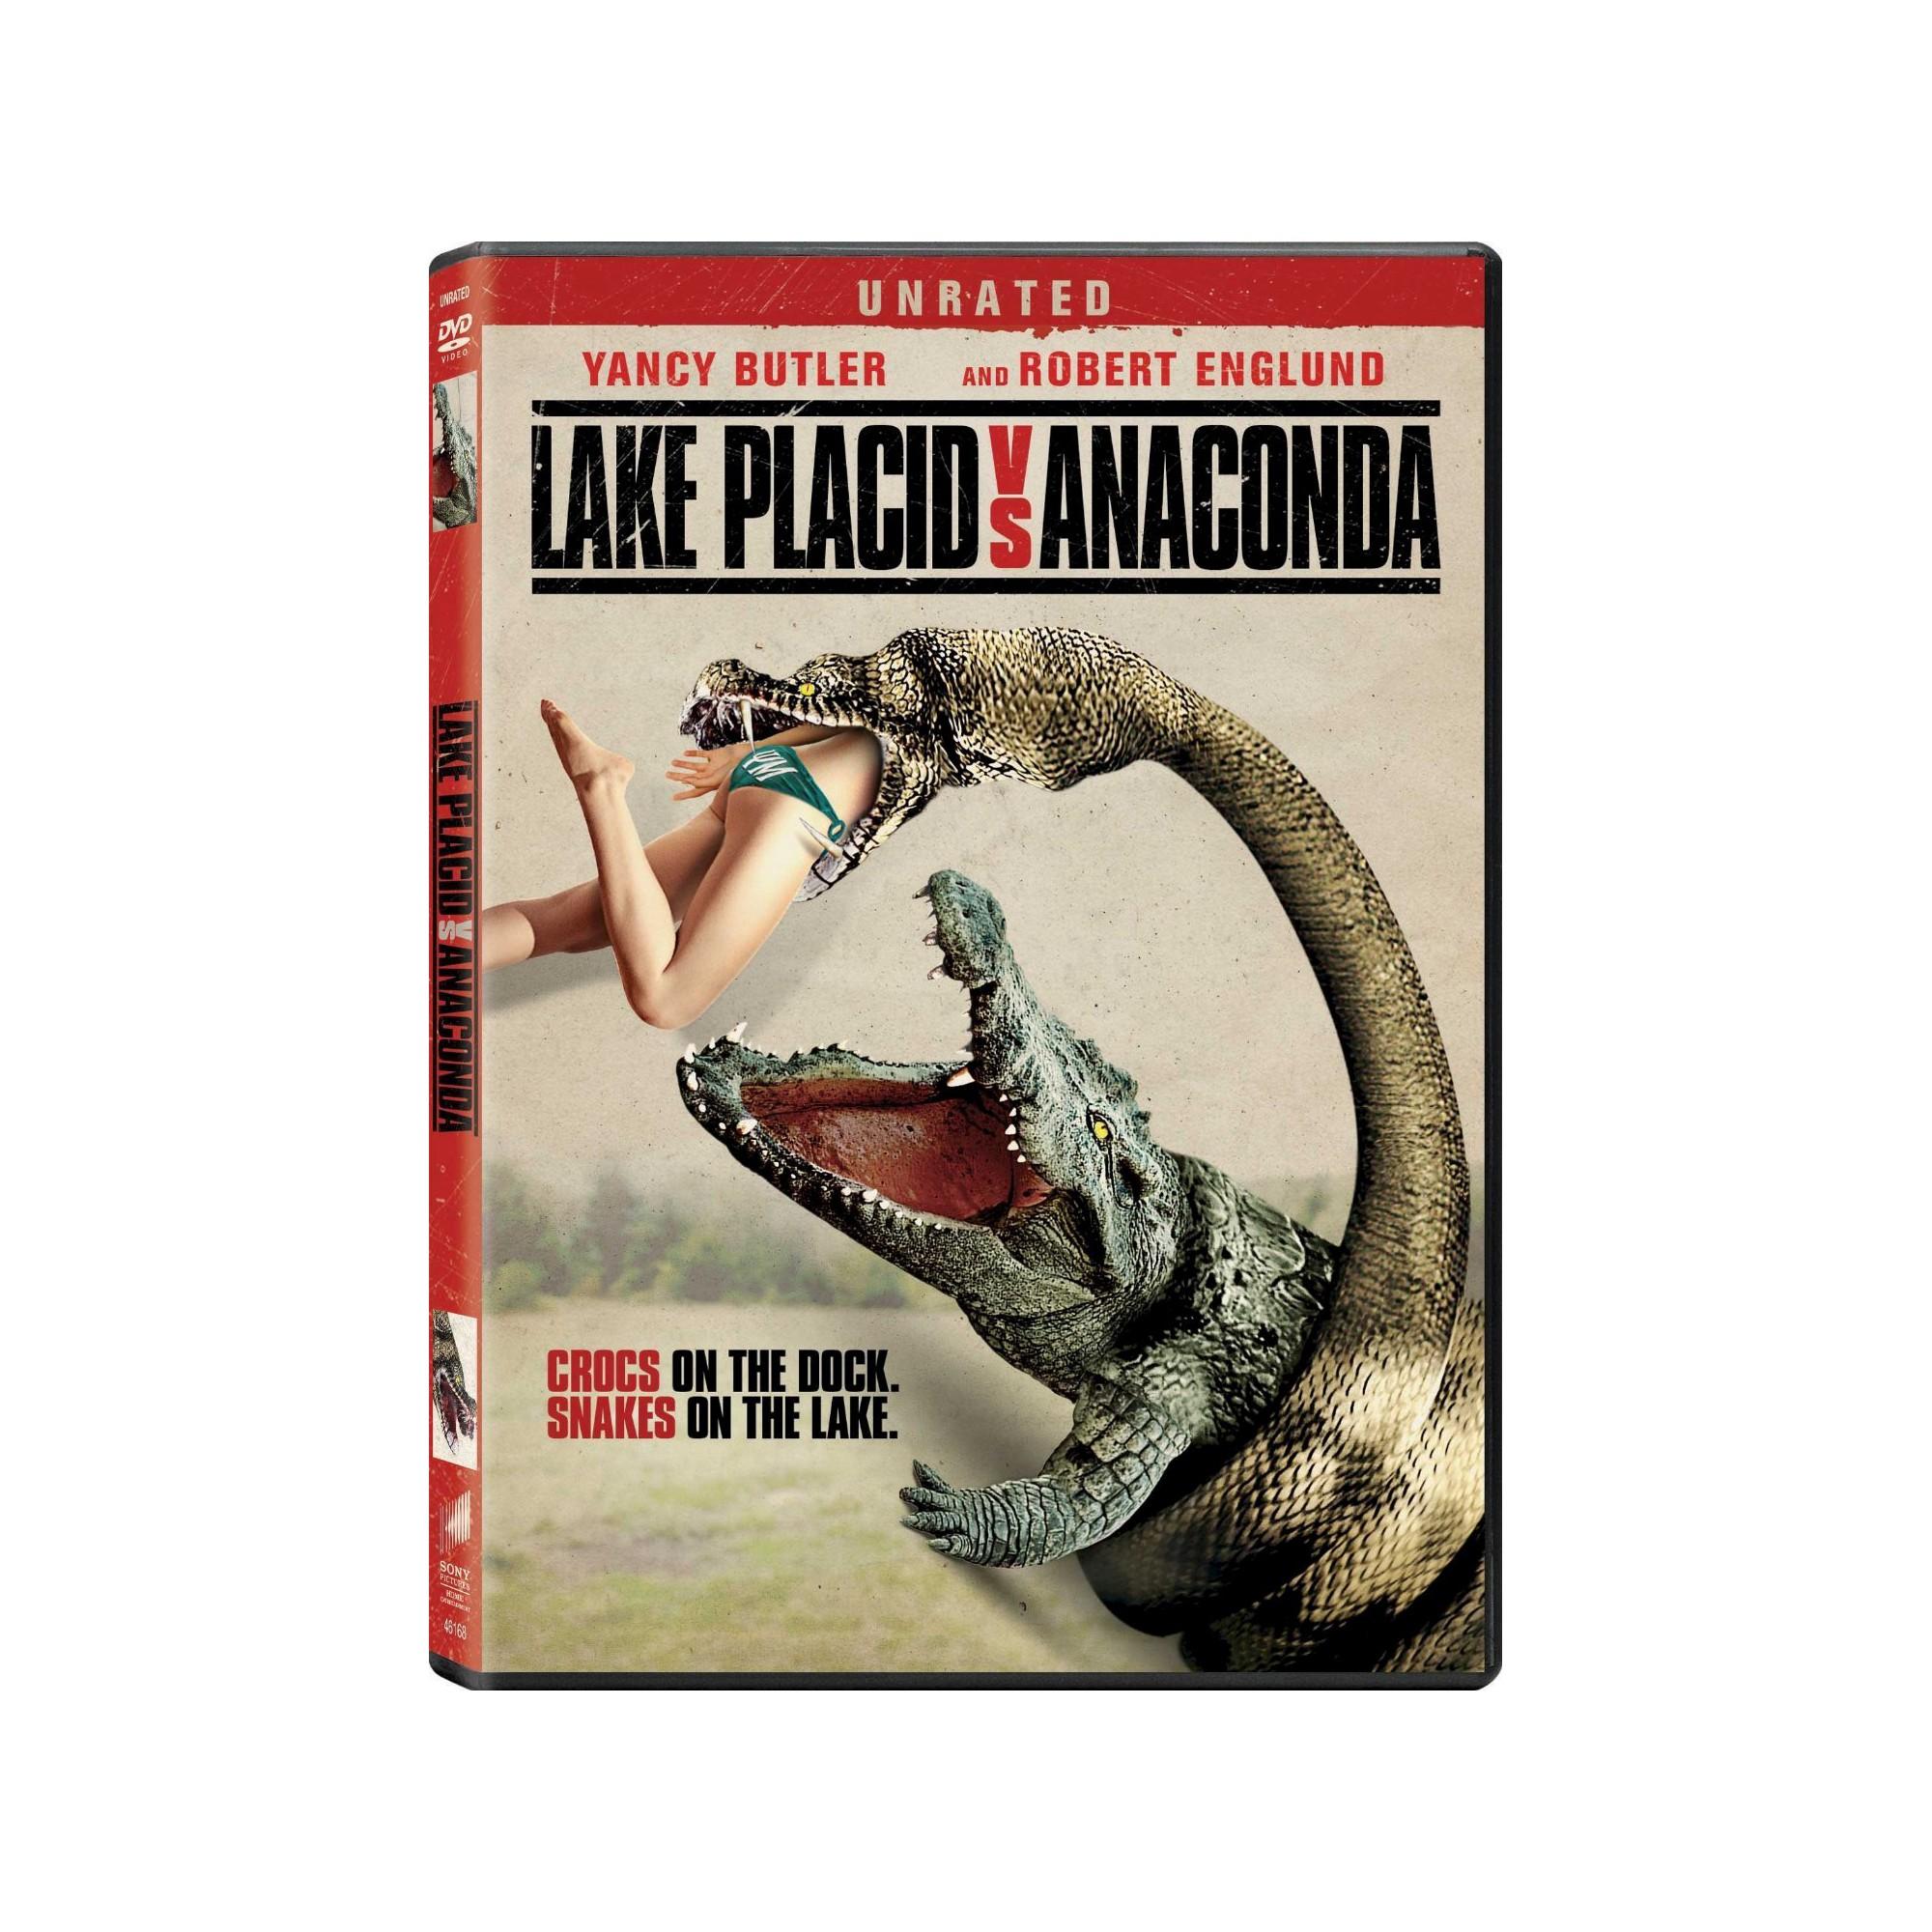 Anaconda Vs Lake Placid Full Movie lake placid vs. anaconda, movies   anaconda, lake placid vs